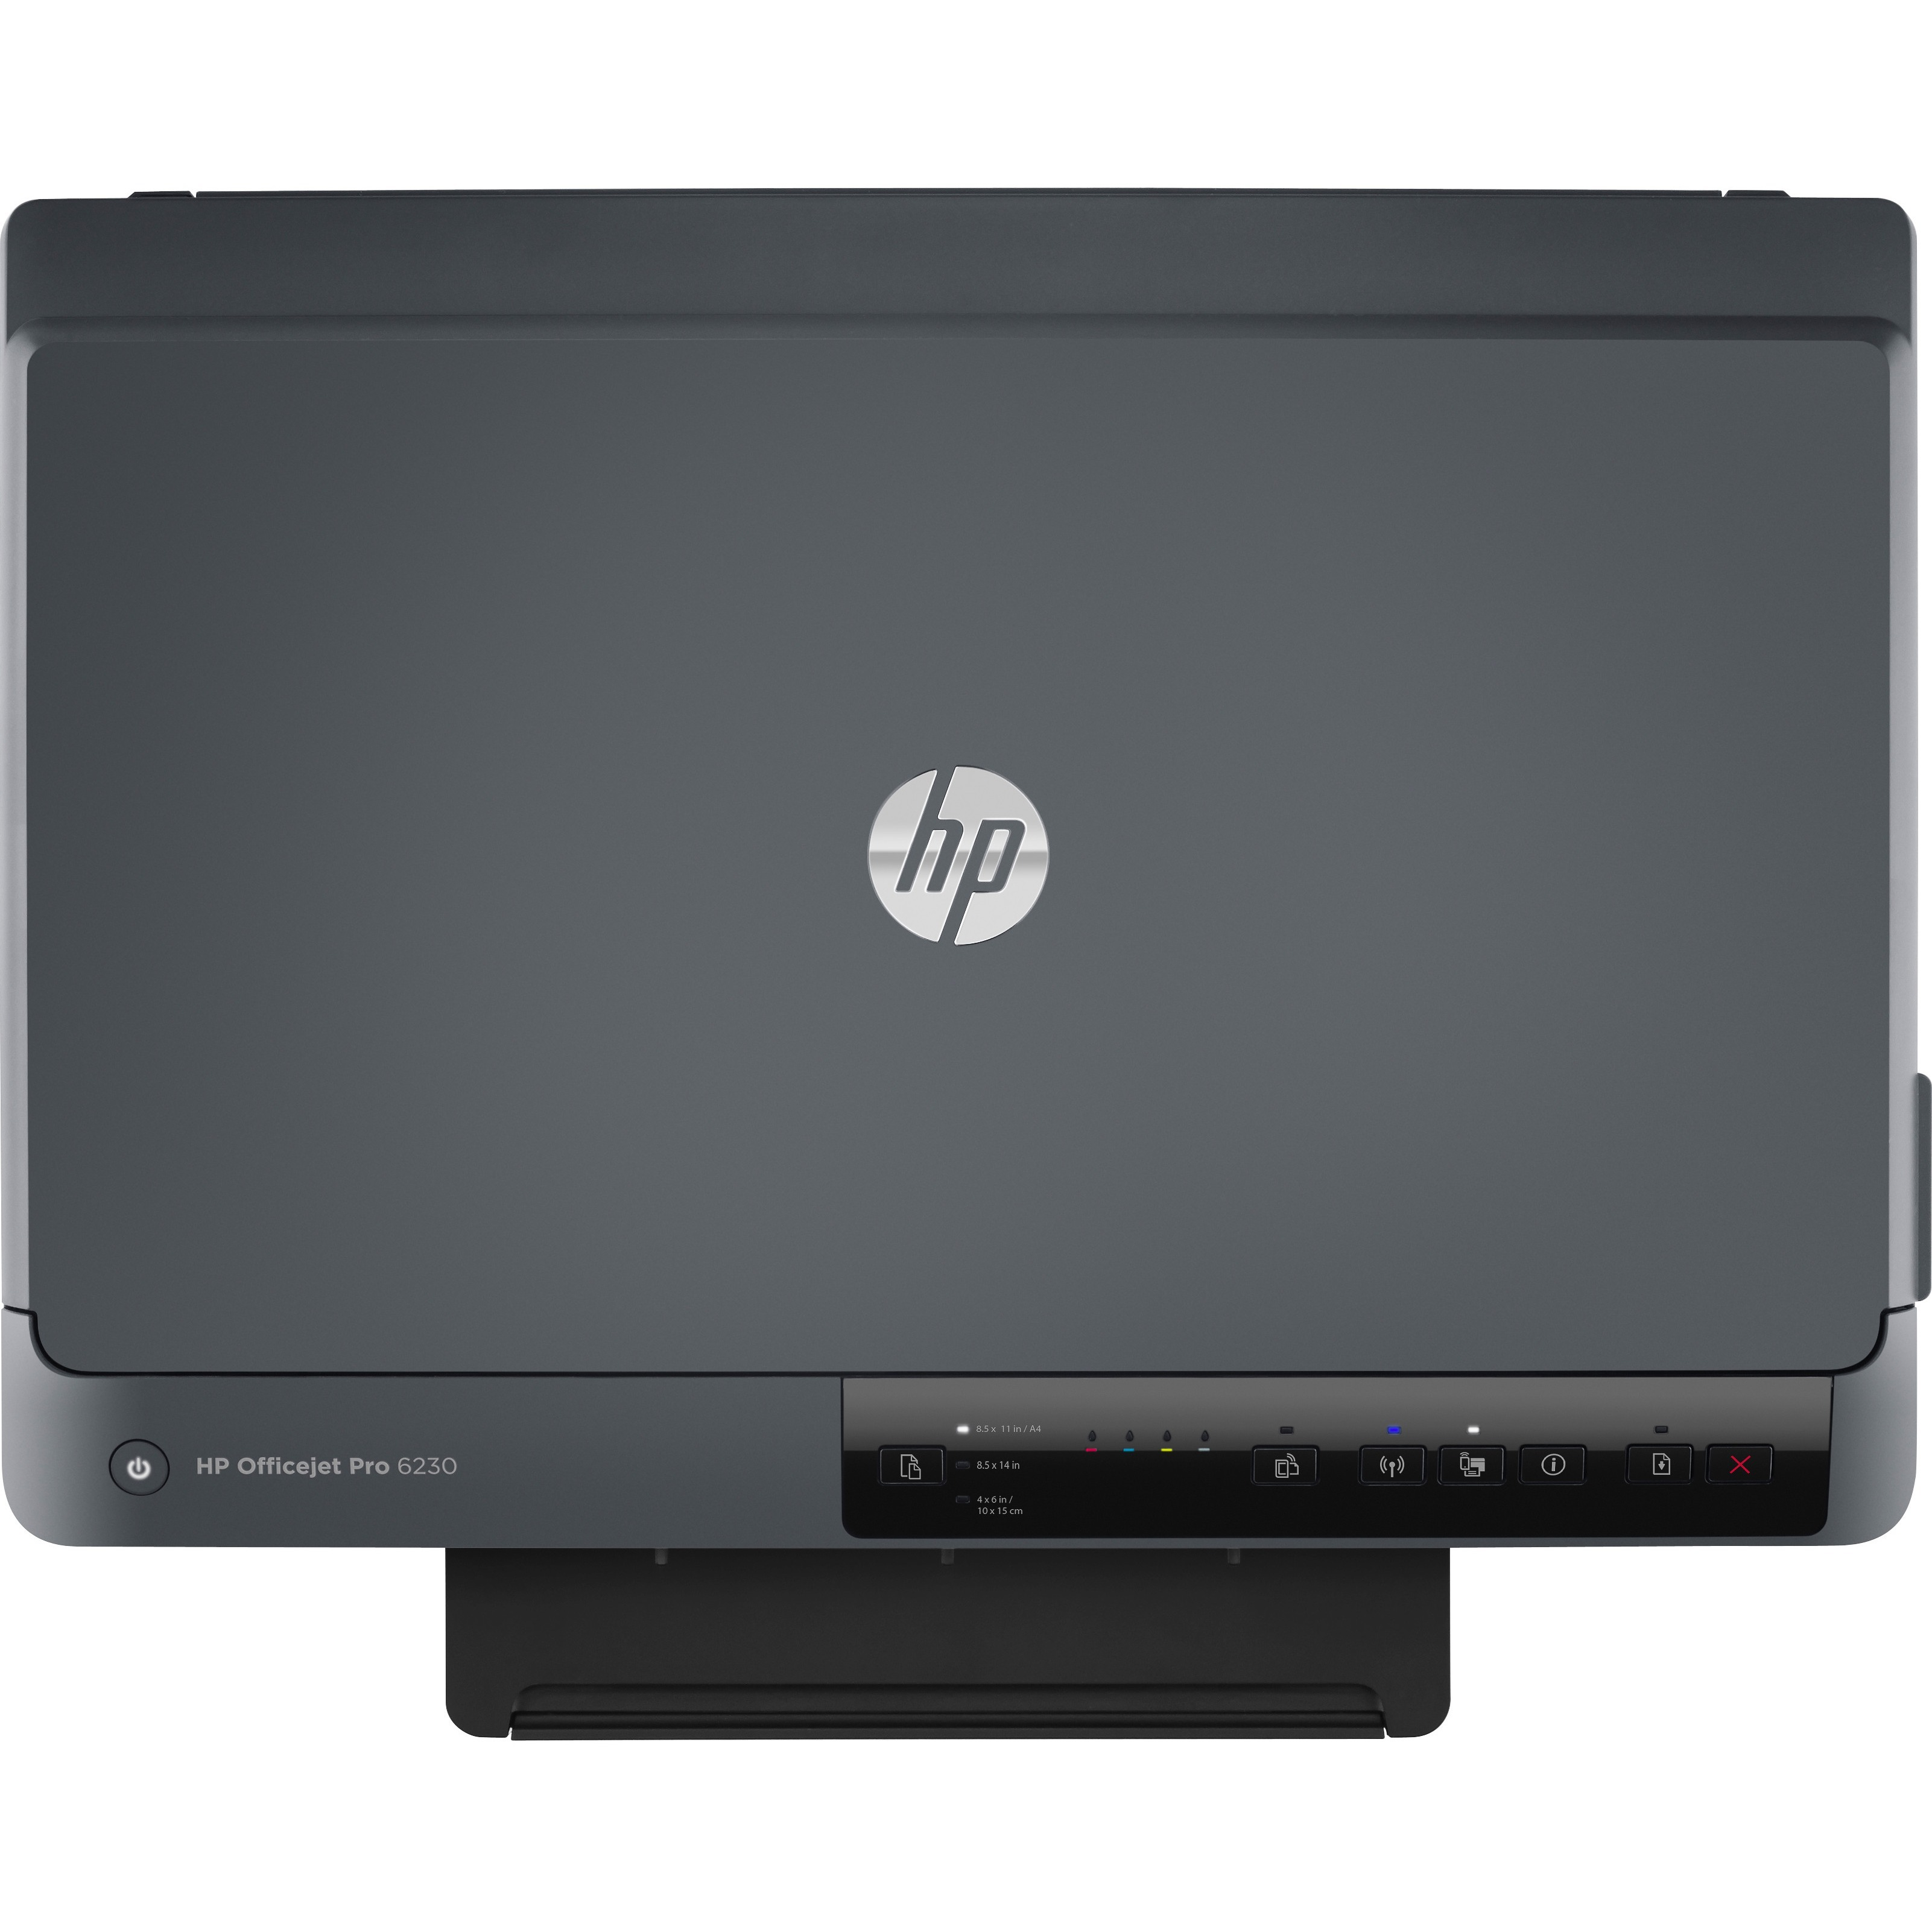 HP Officejet Pro 6230 Inkjet Printer - Colour - 600 x 1200 dpi Print - Plain Paper Print - Desktop